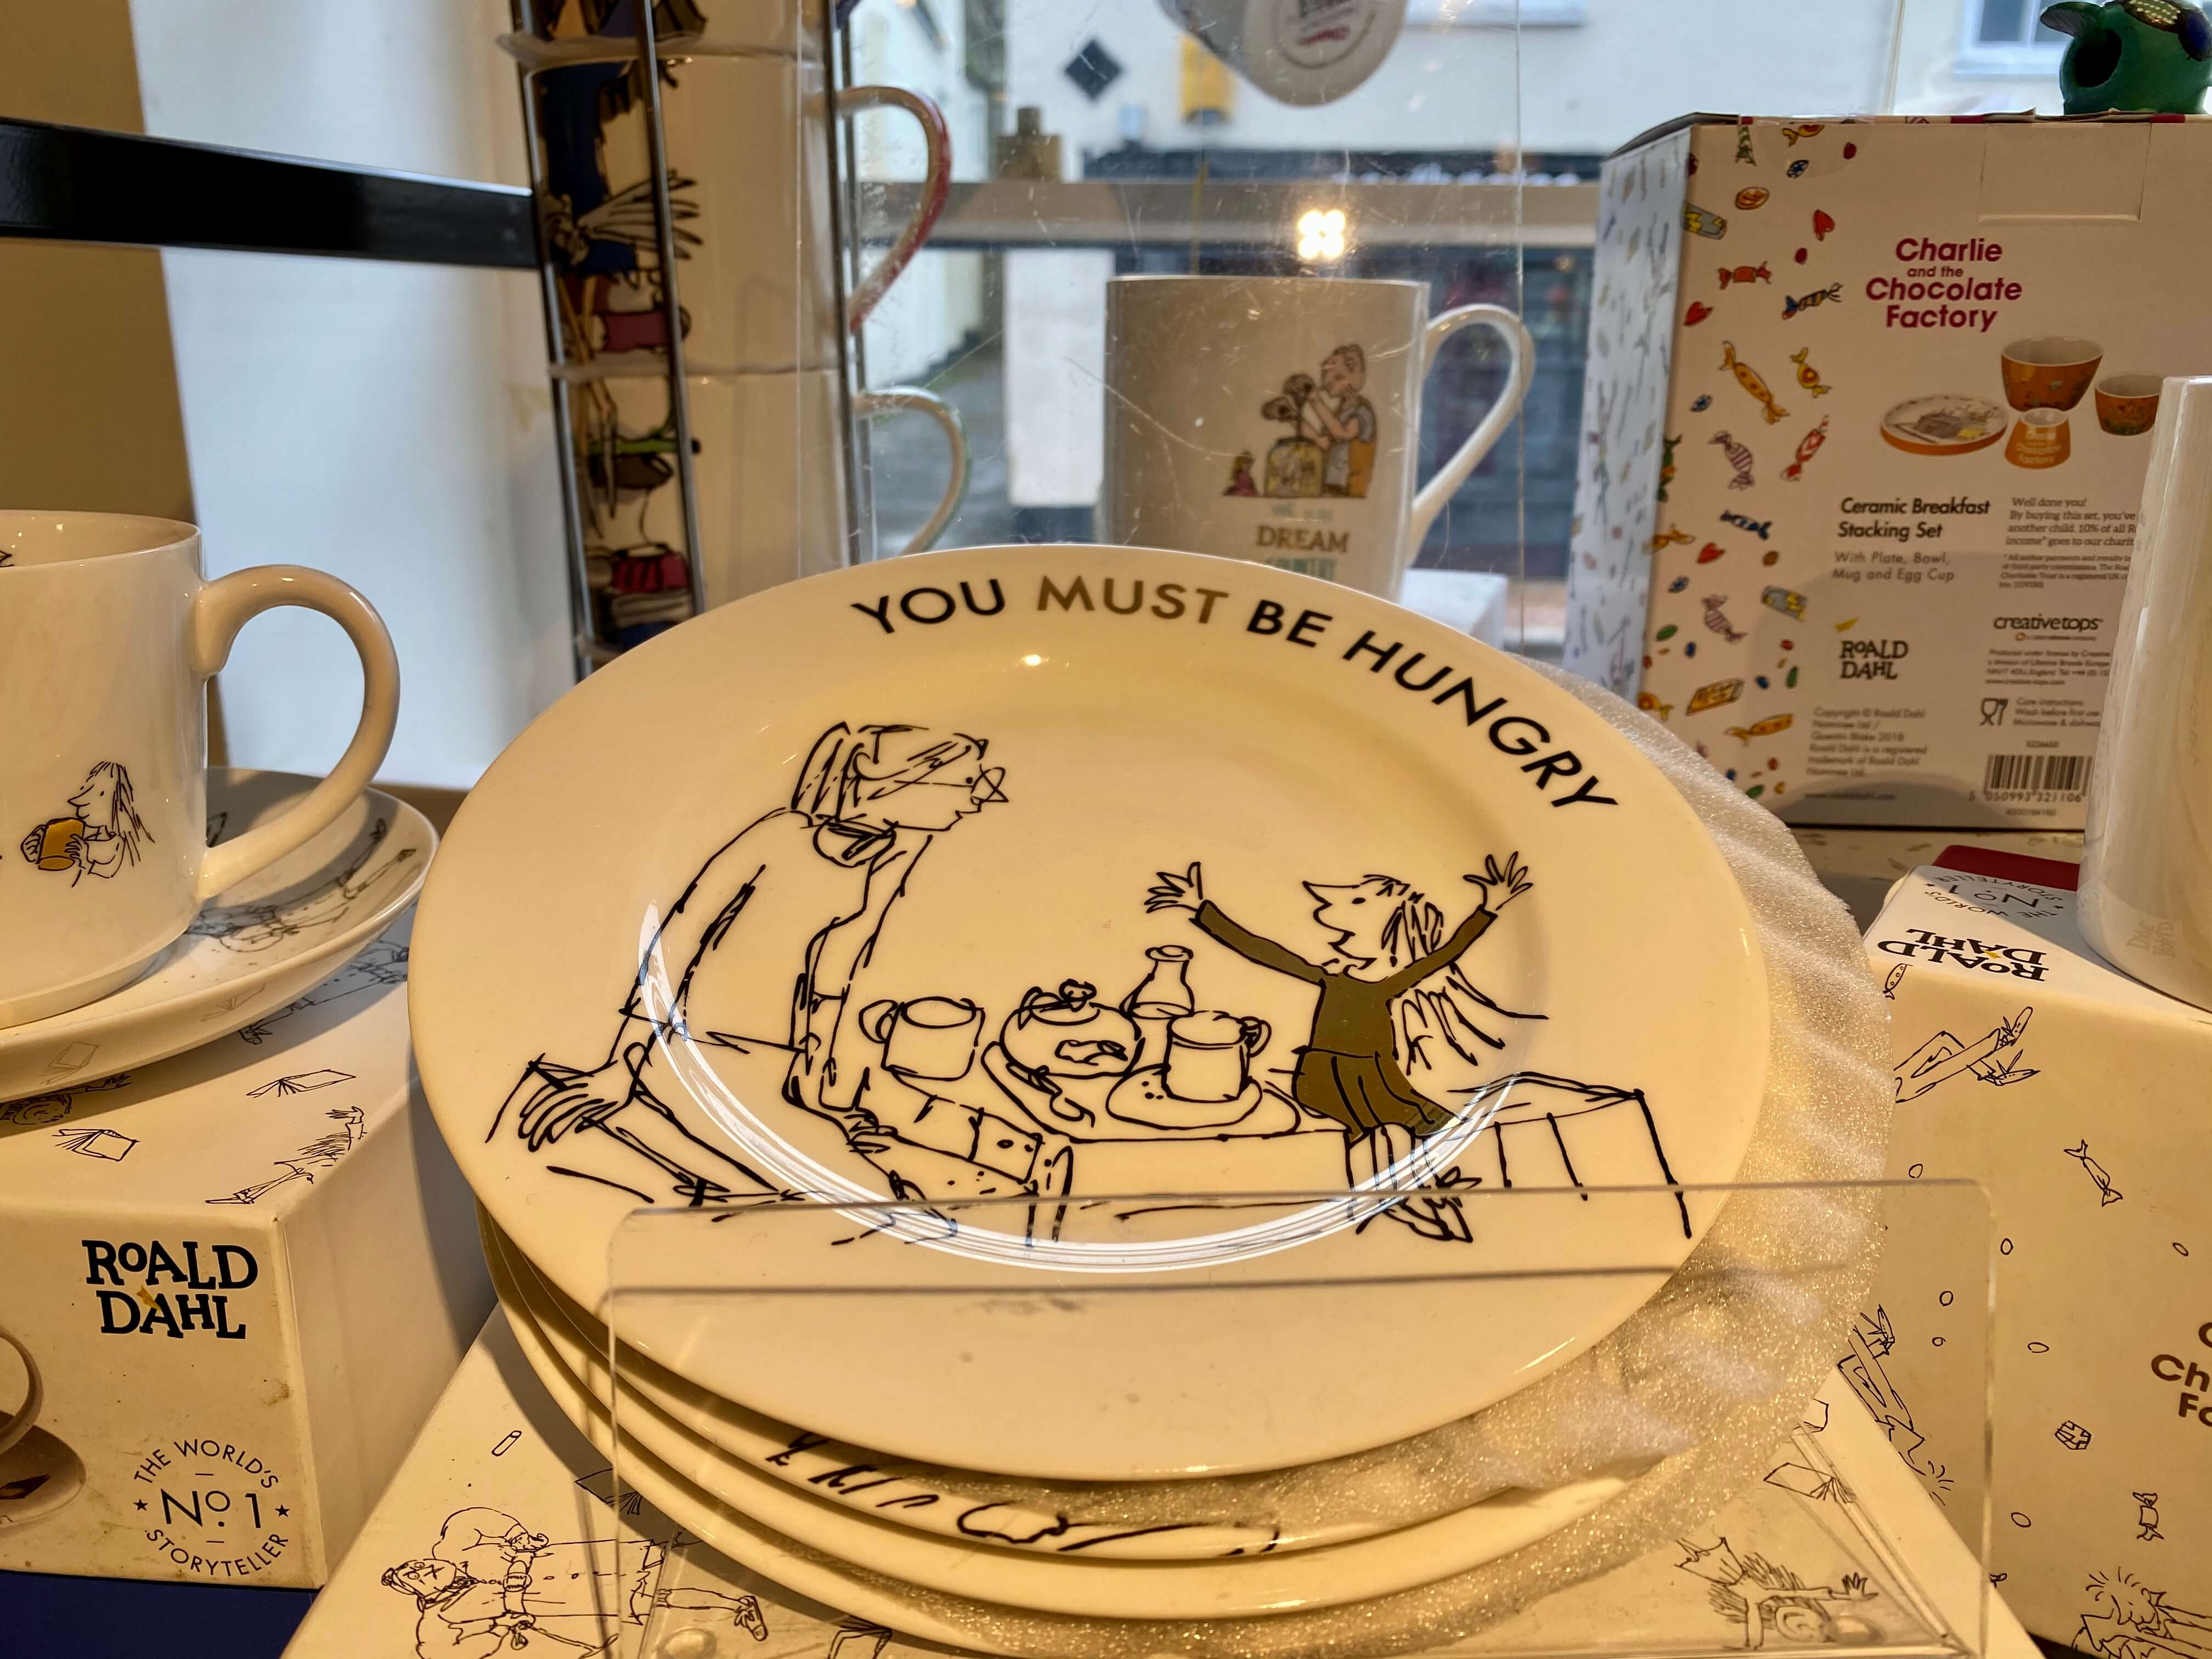 The Roald Dahl Museum